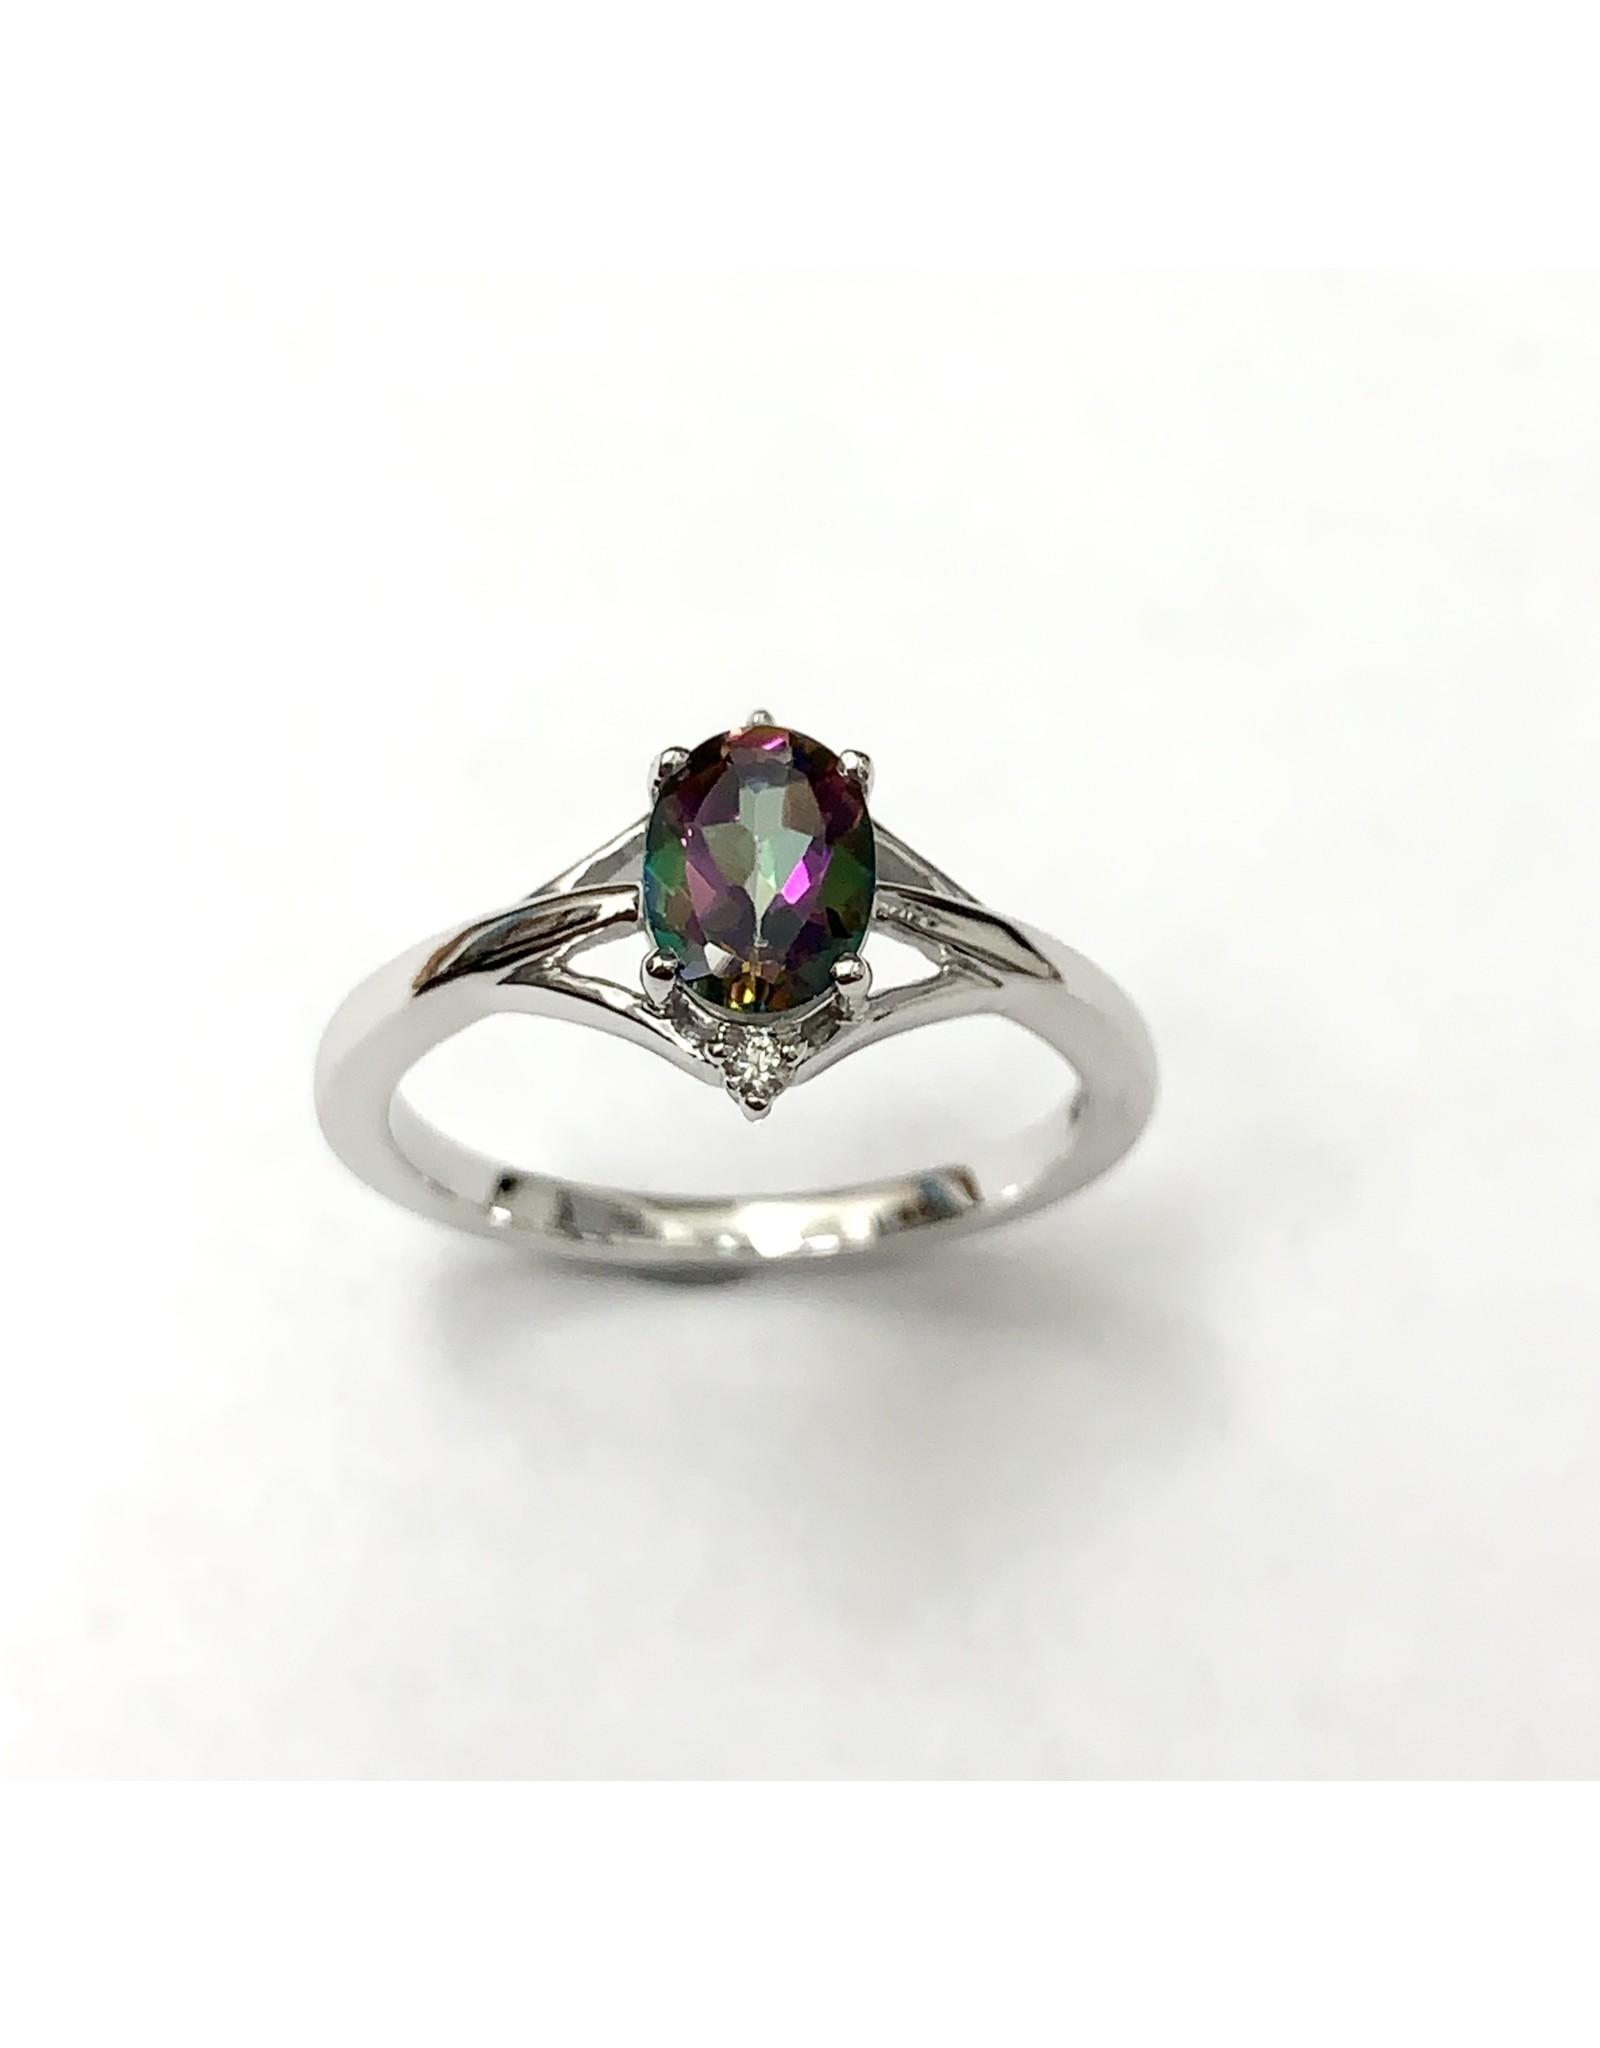 Mystic Topaz & Diamond Ring 10KW